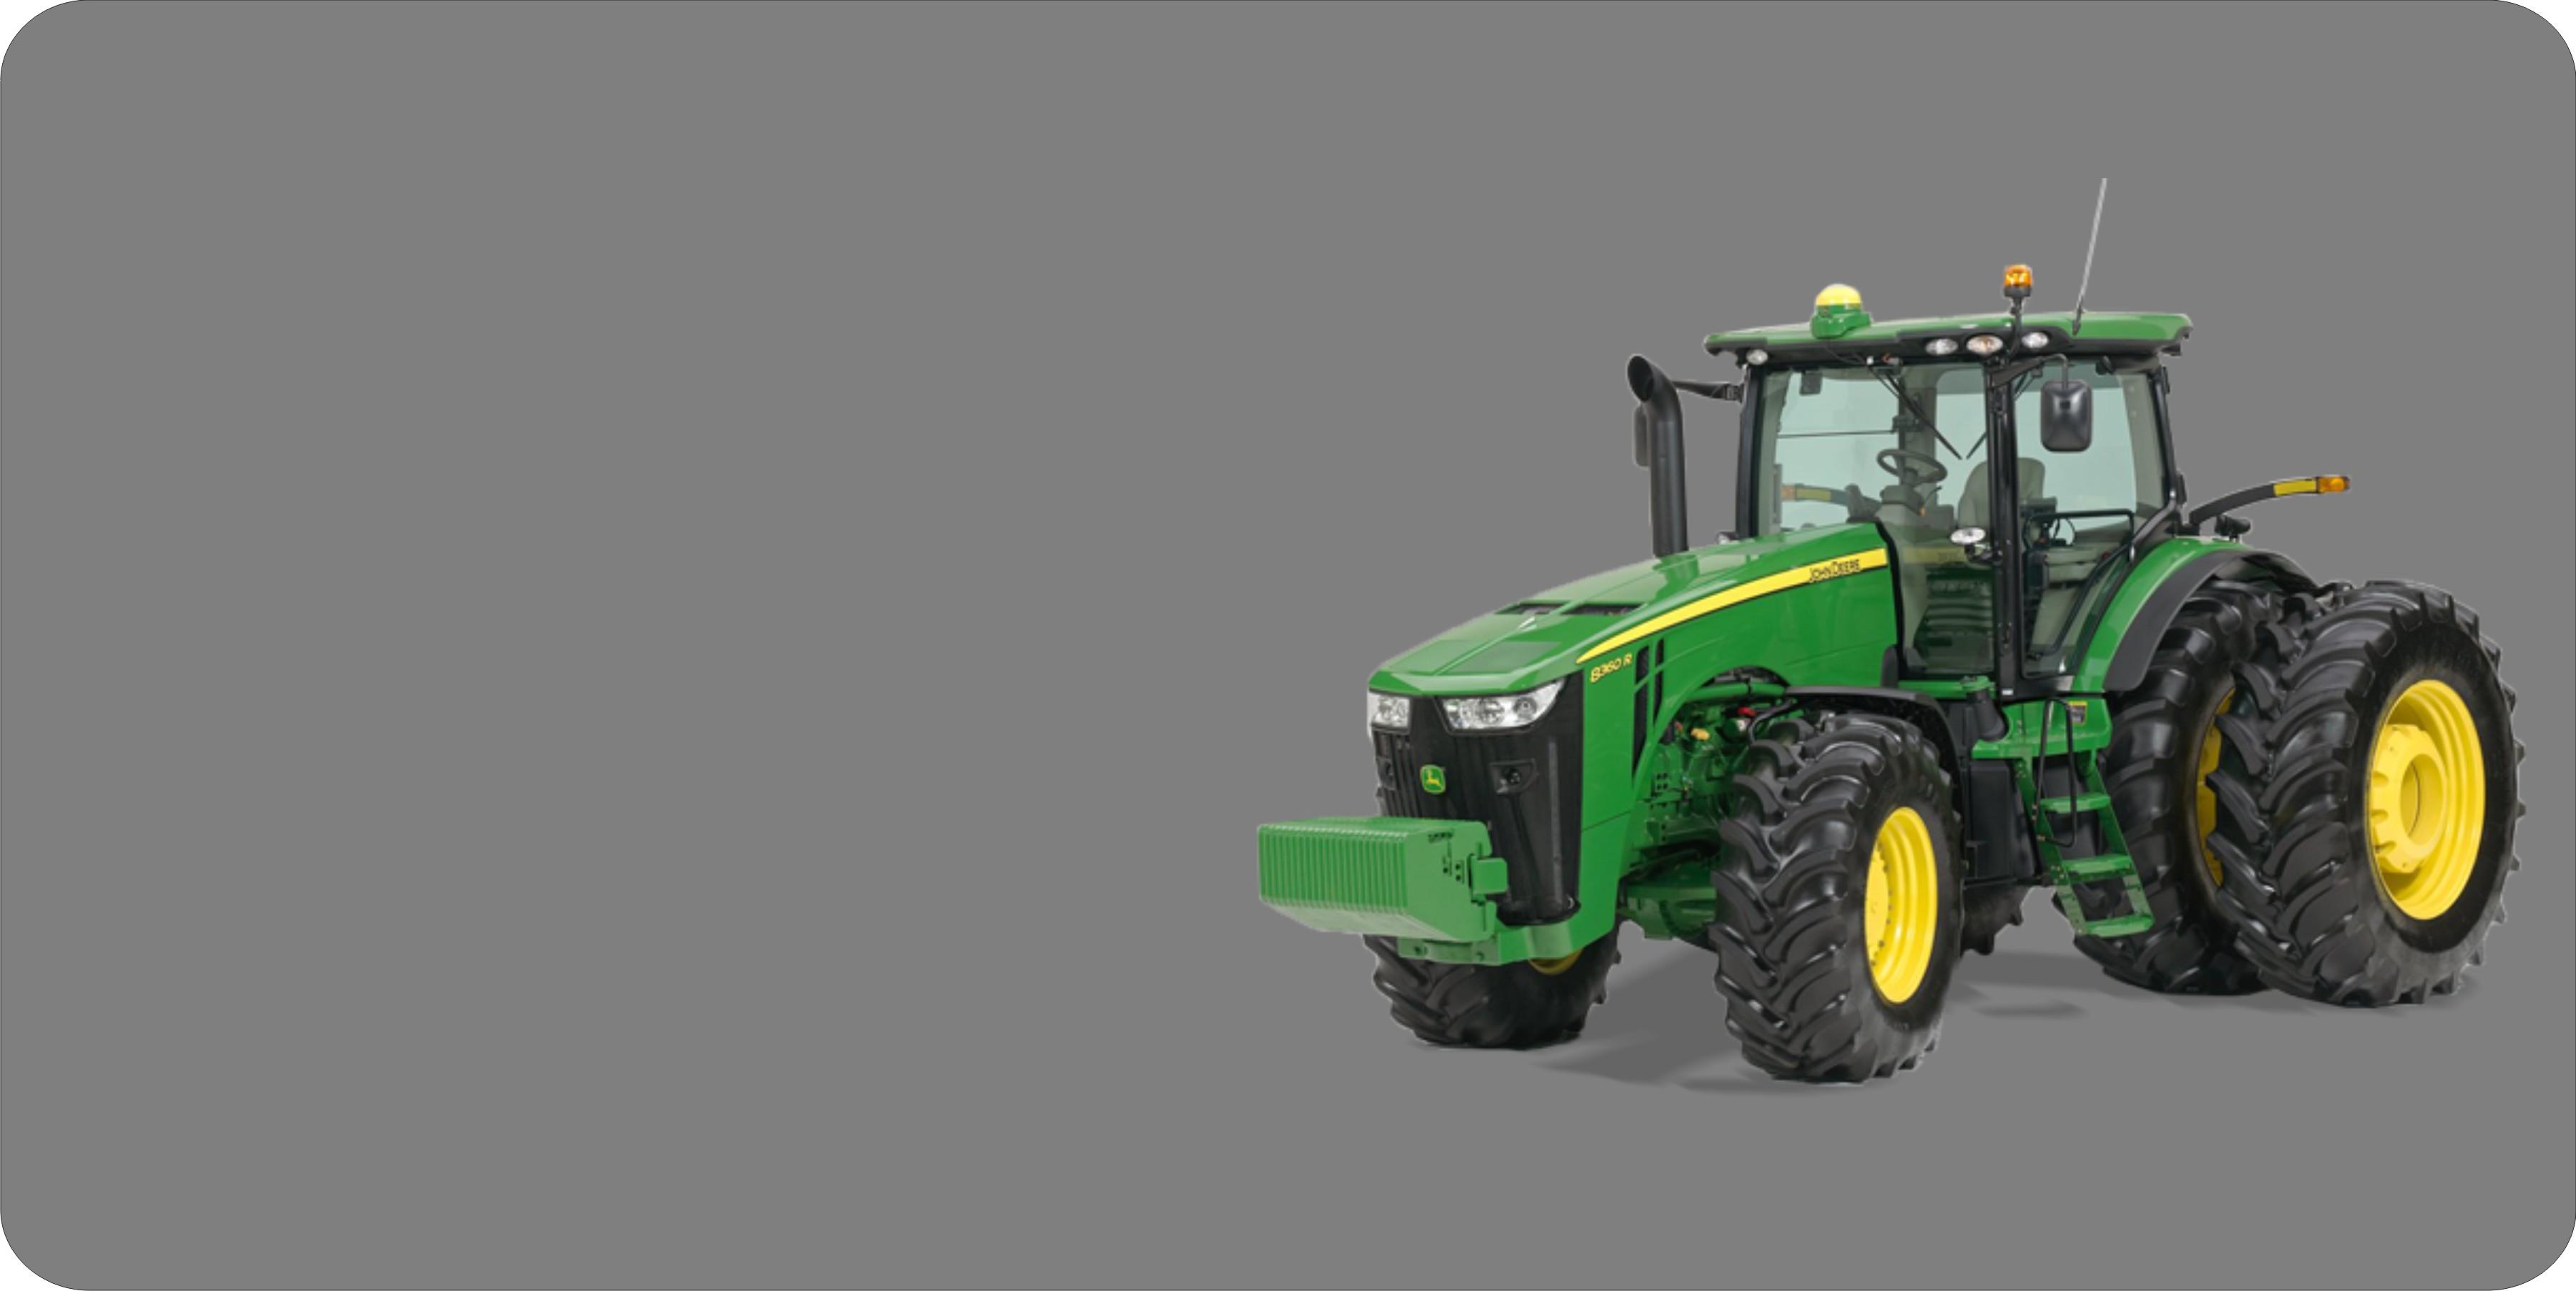 JOHN DEERE Tractor Offset On Grey Plate